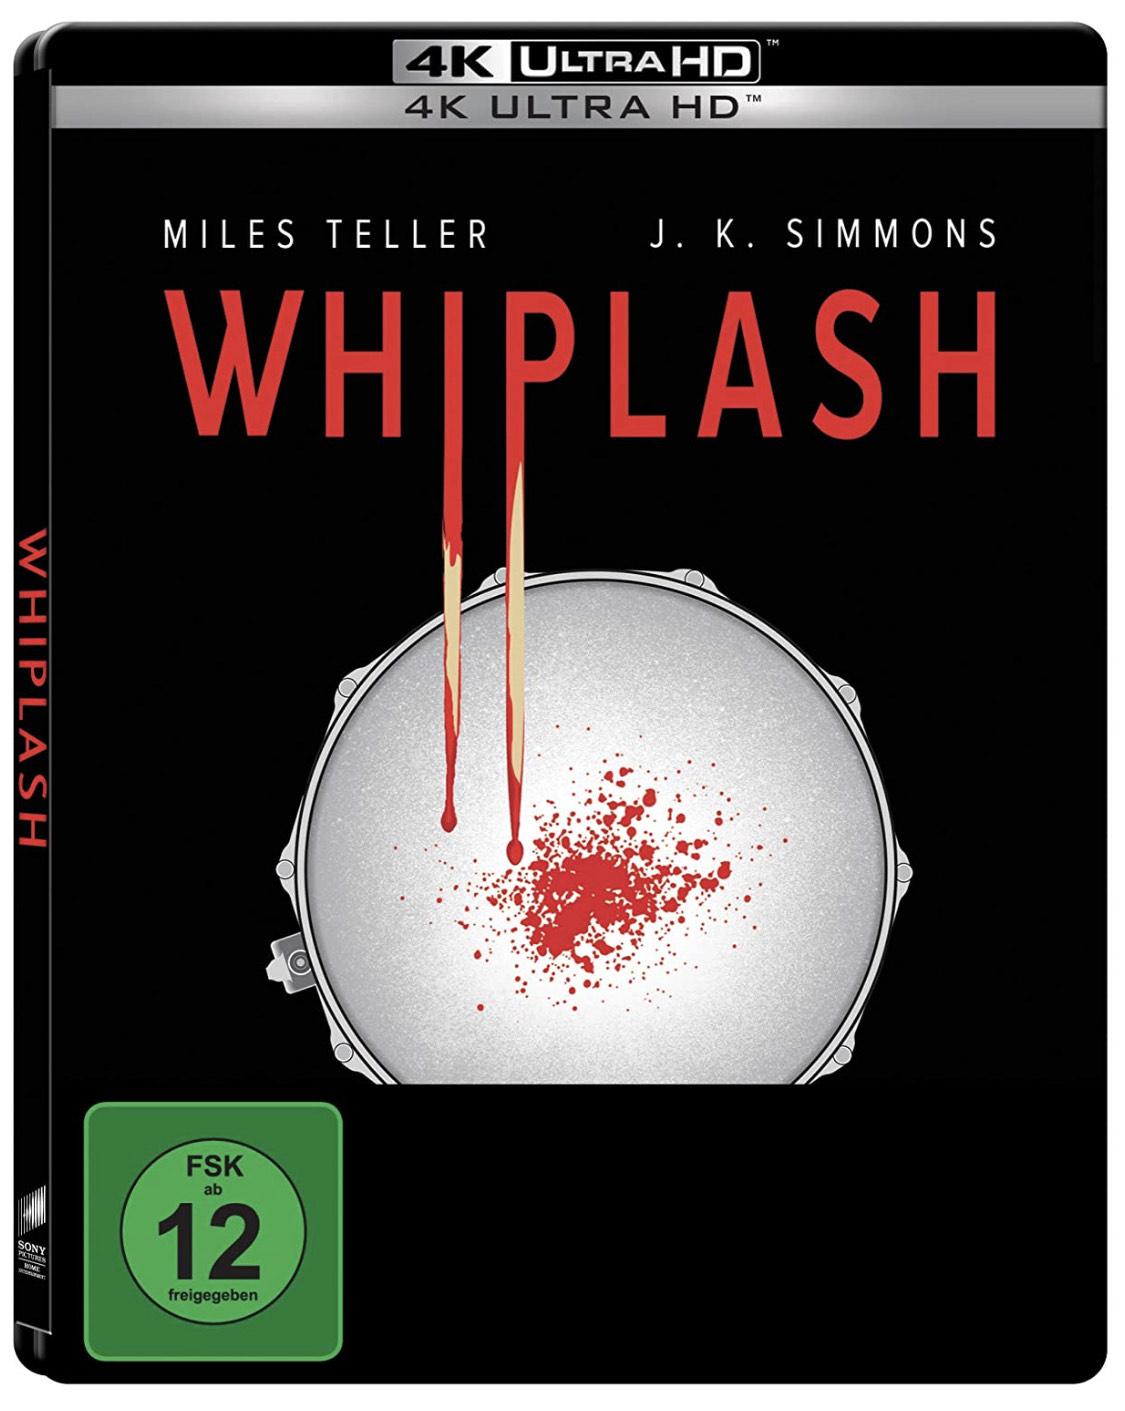 Whiplash (4K UHD Steelbook)